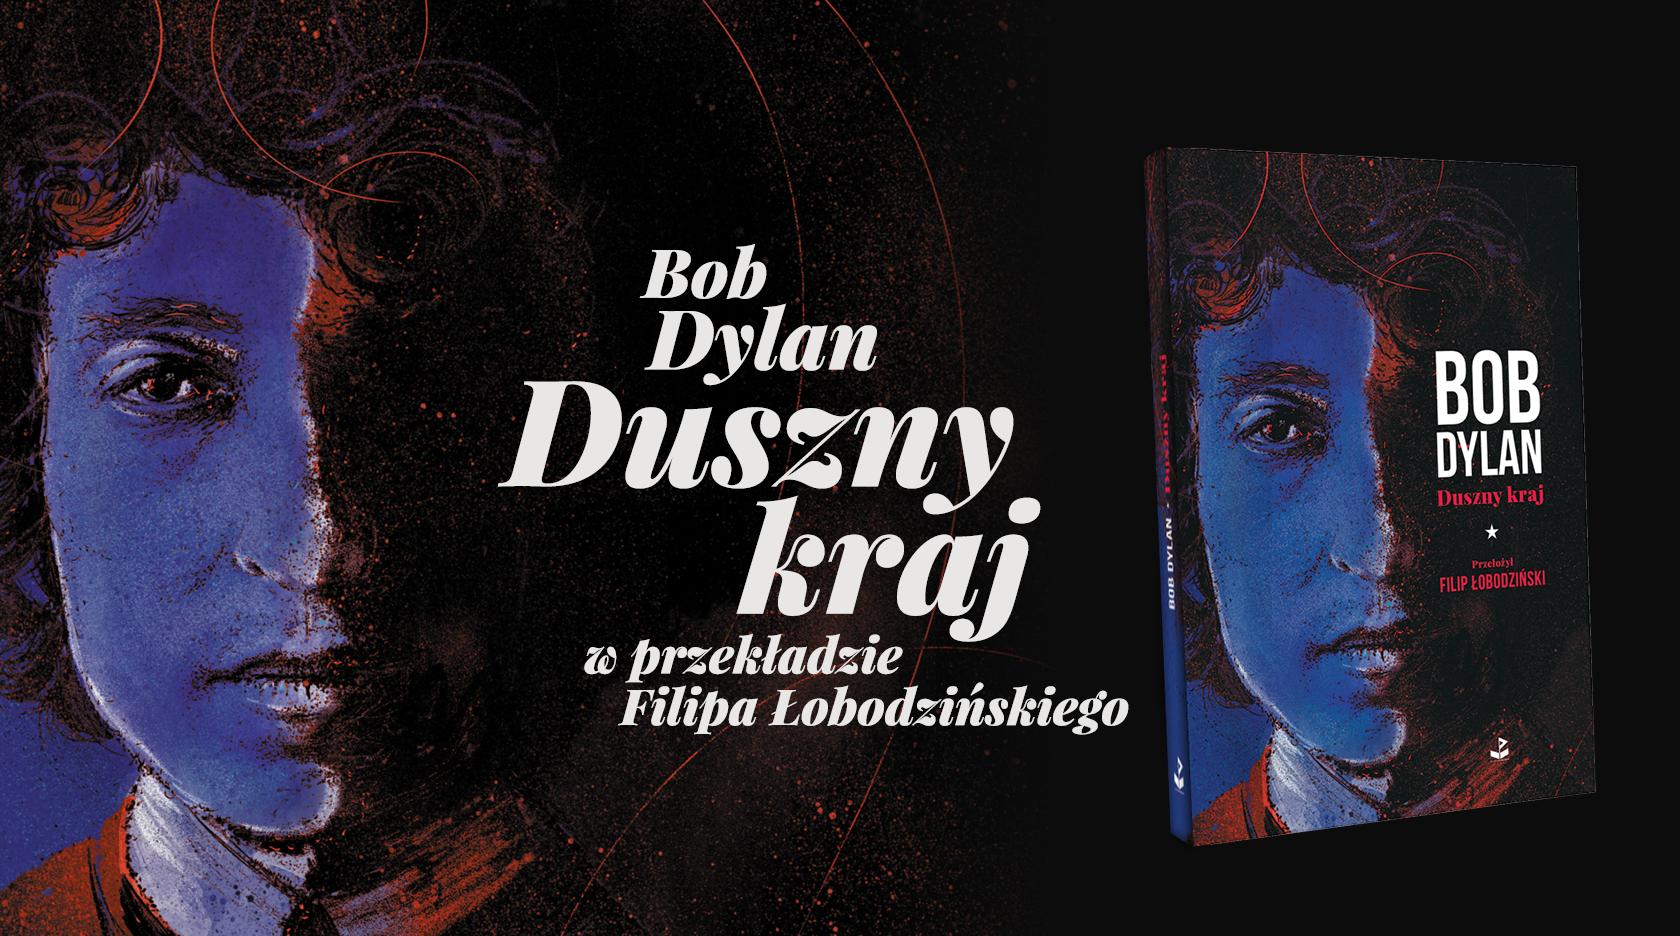 BL Img 2017.02.20 Bob DYLAN Duszny kraj_www_top